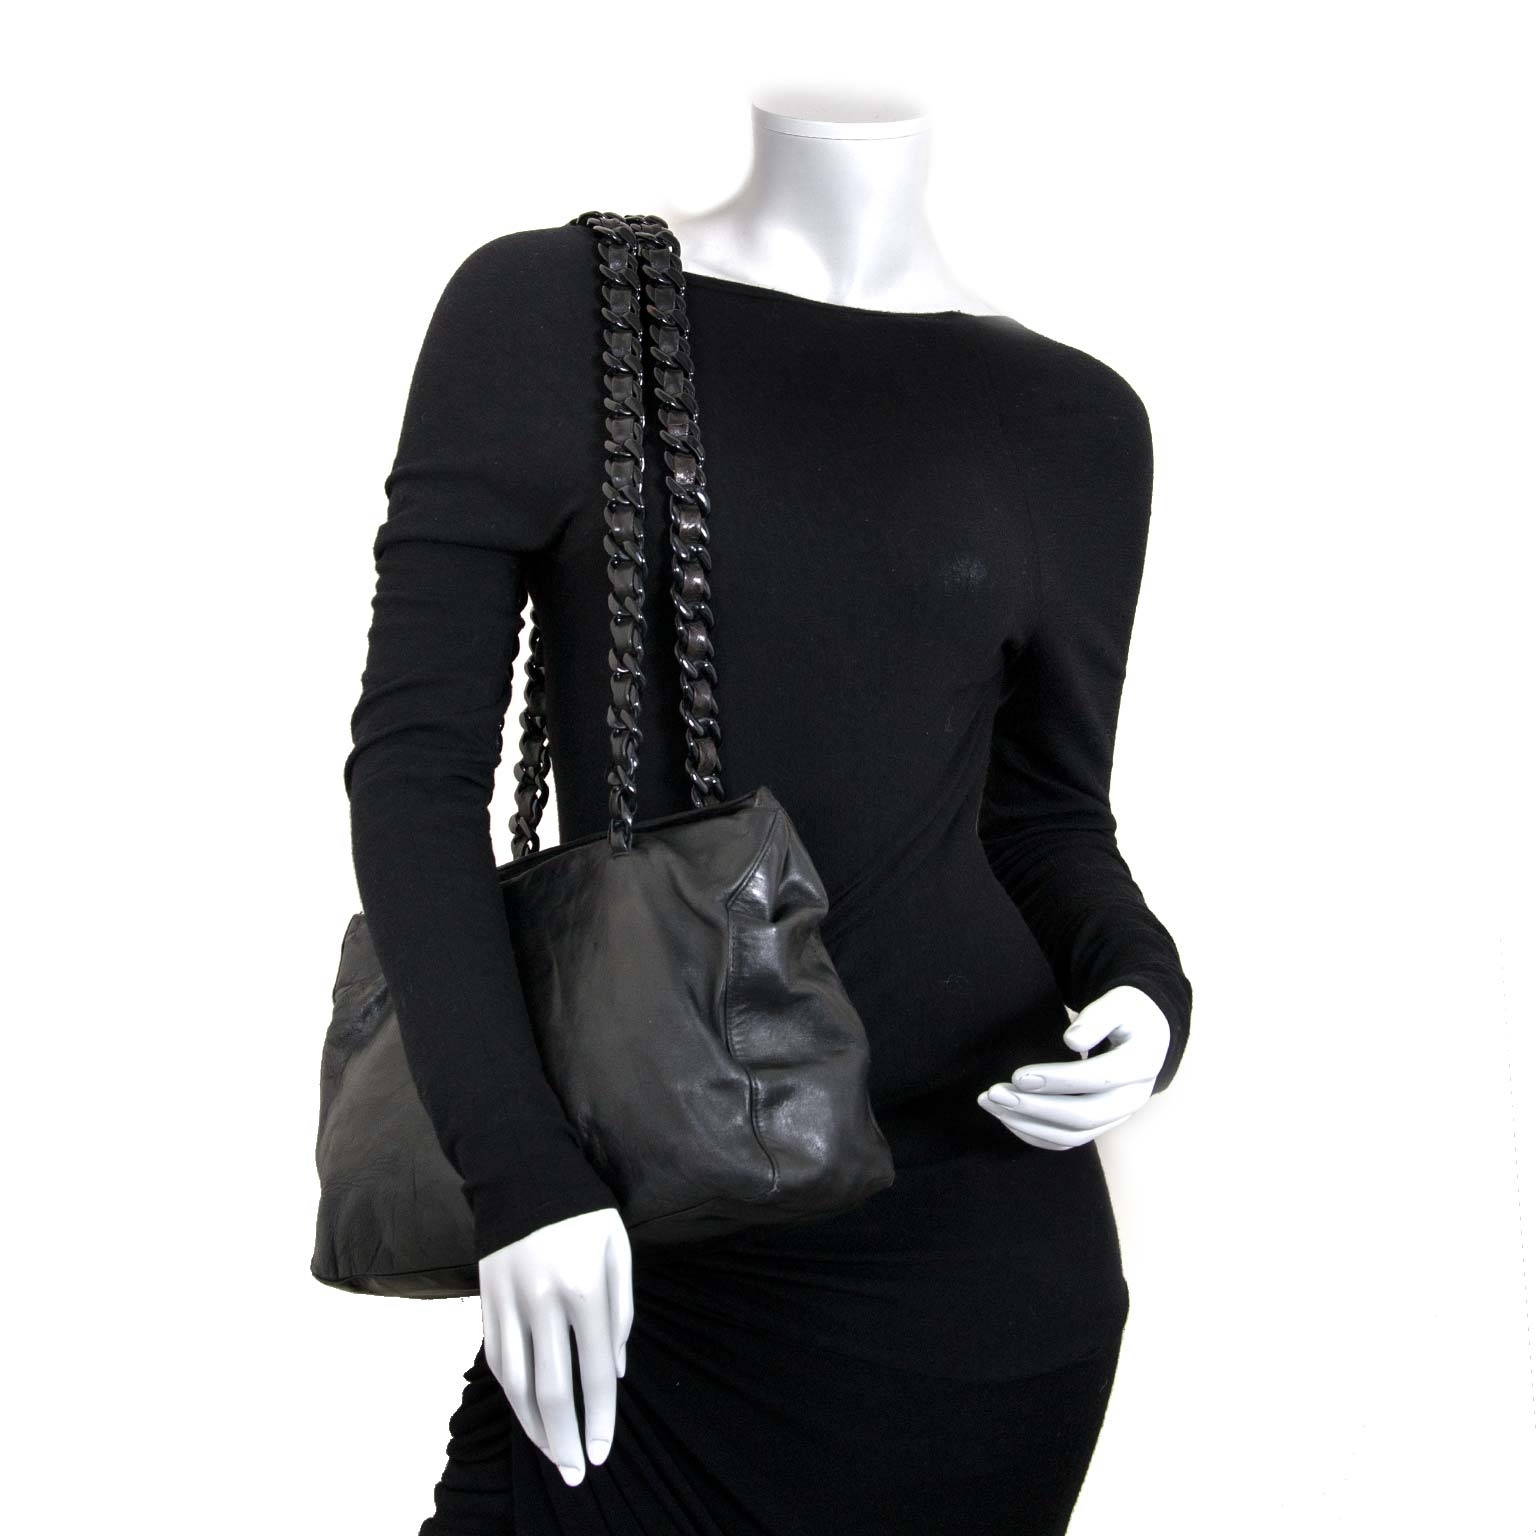 Prada Black Leather Shoulder Bag for sale at labellov for the best price